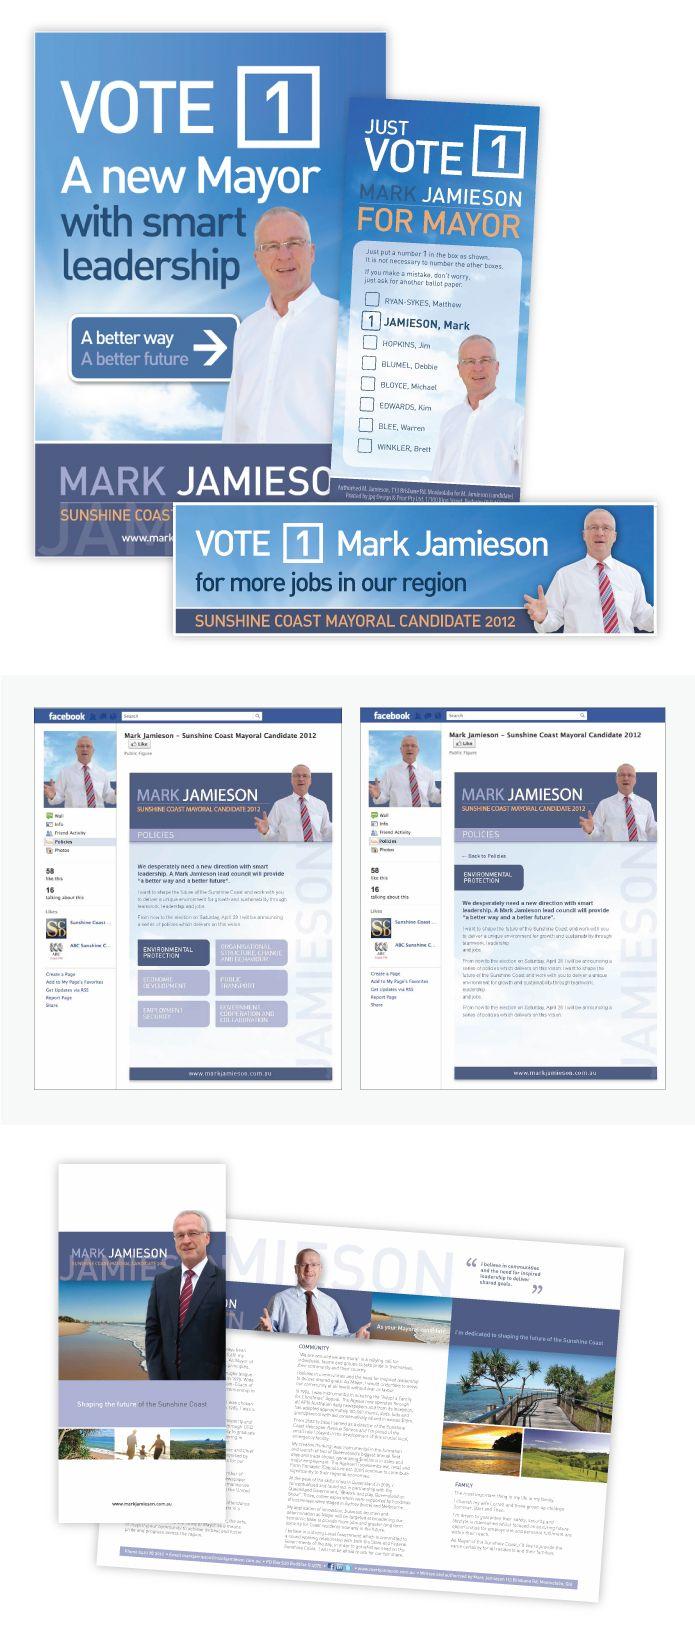 Mark Jamieson for Mayor